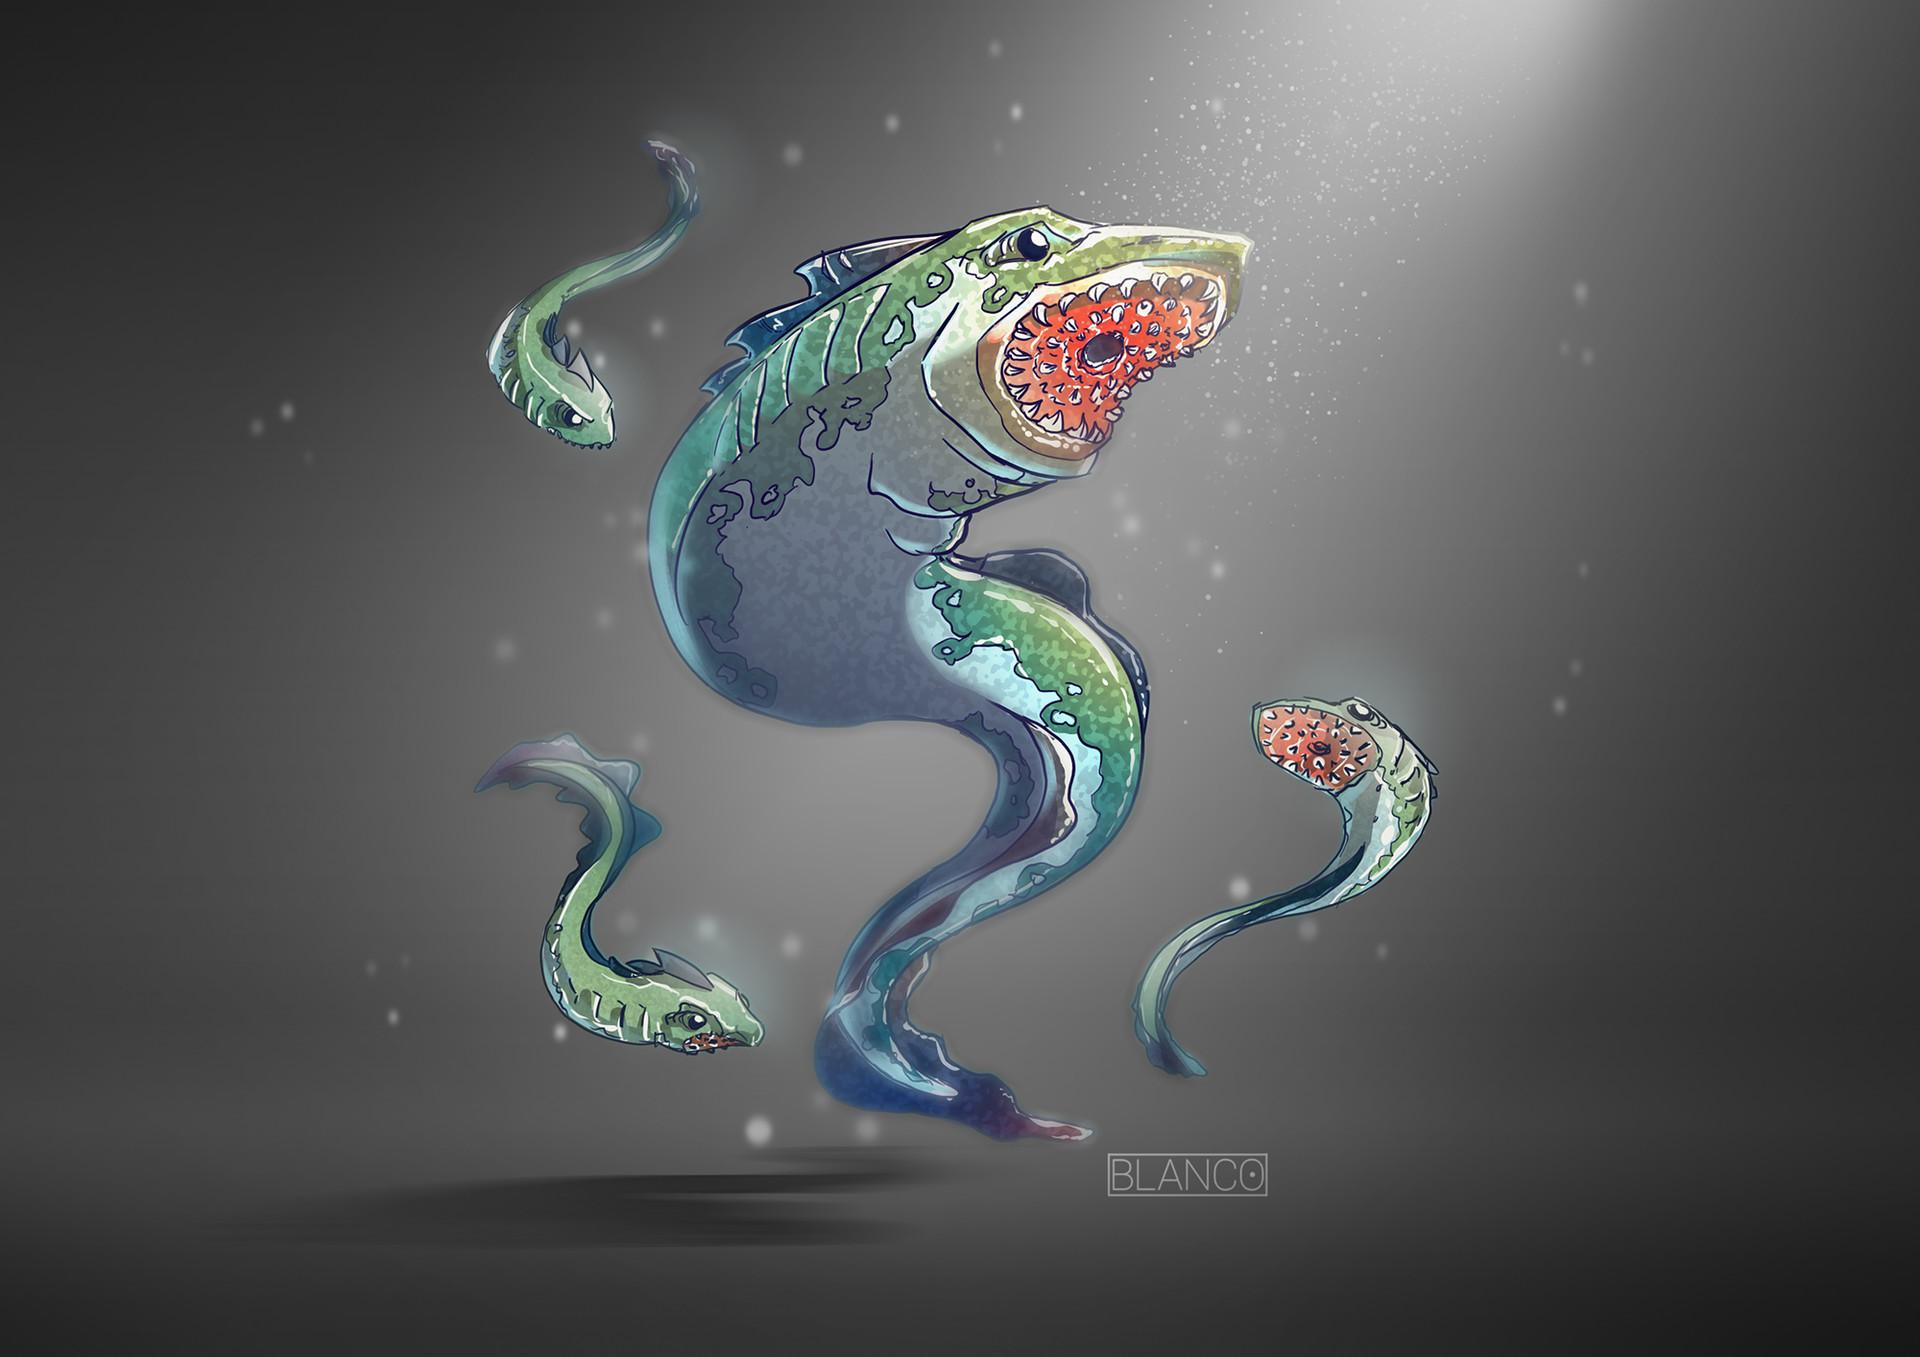 Felipe blanco lamprey minion